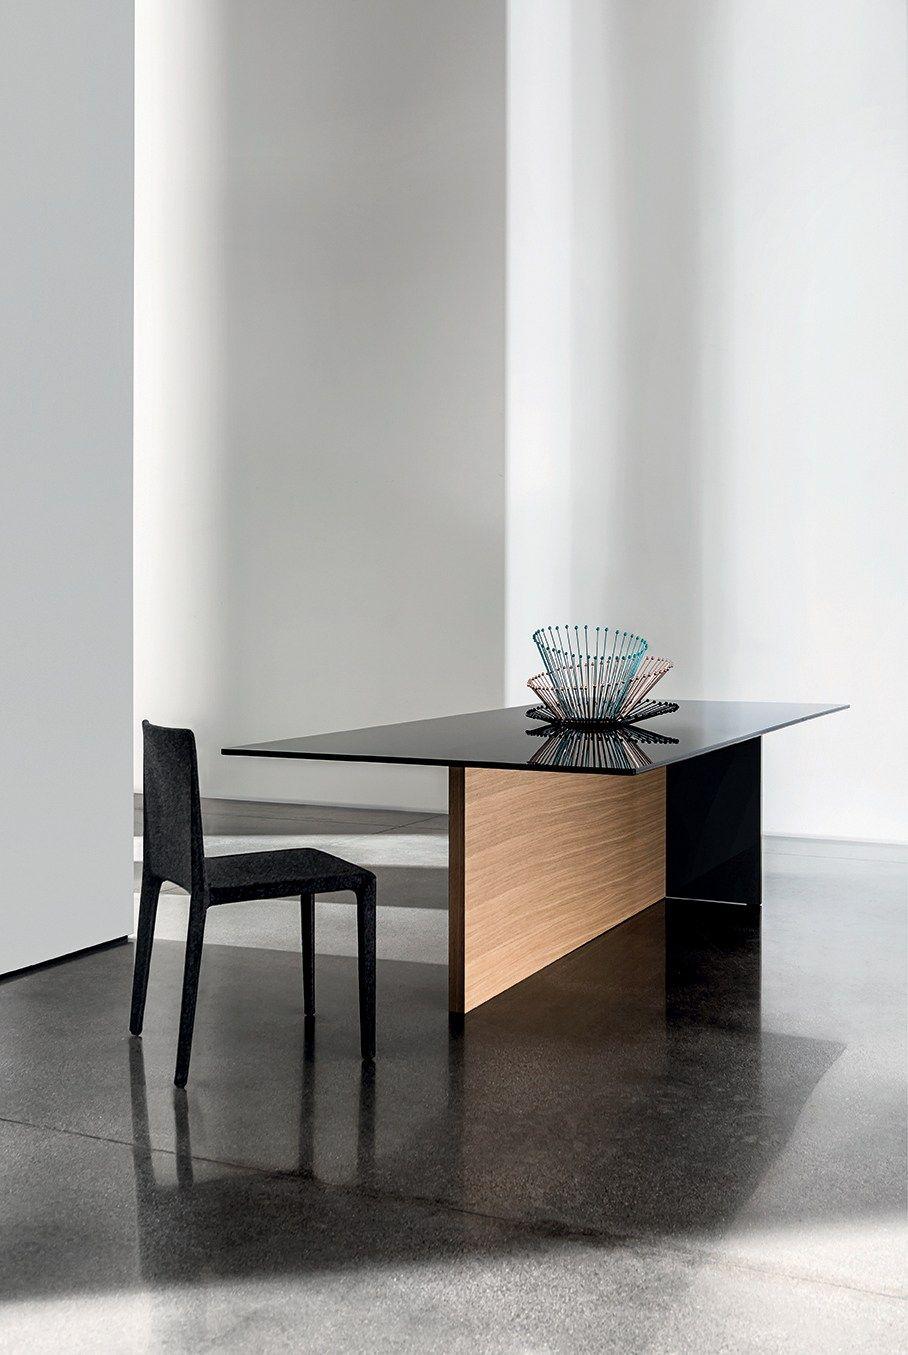 regolo mesa rectangular coleccin regolo by sovet italia diseo lievore altherr molina